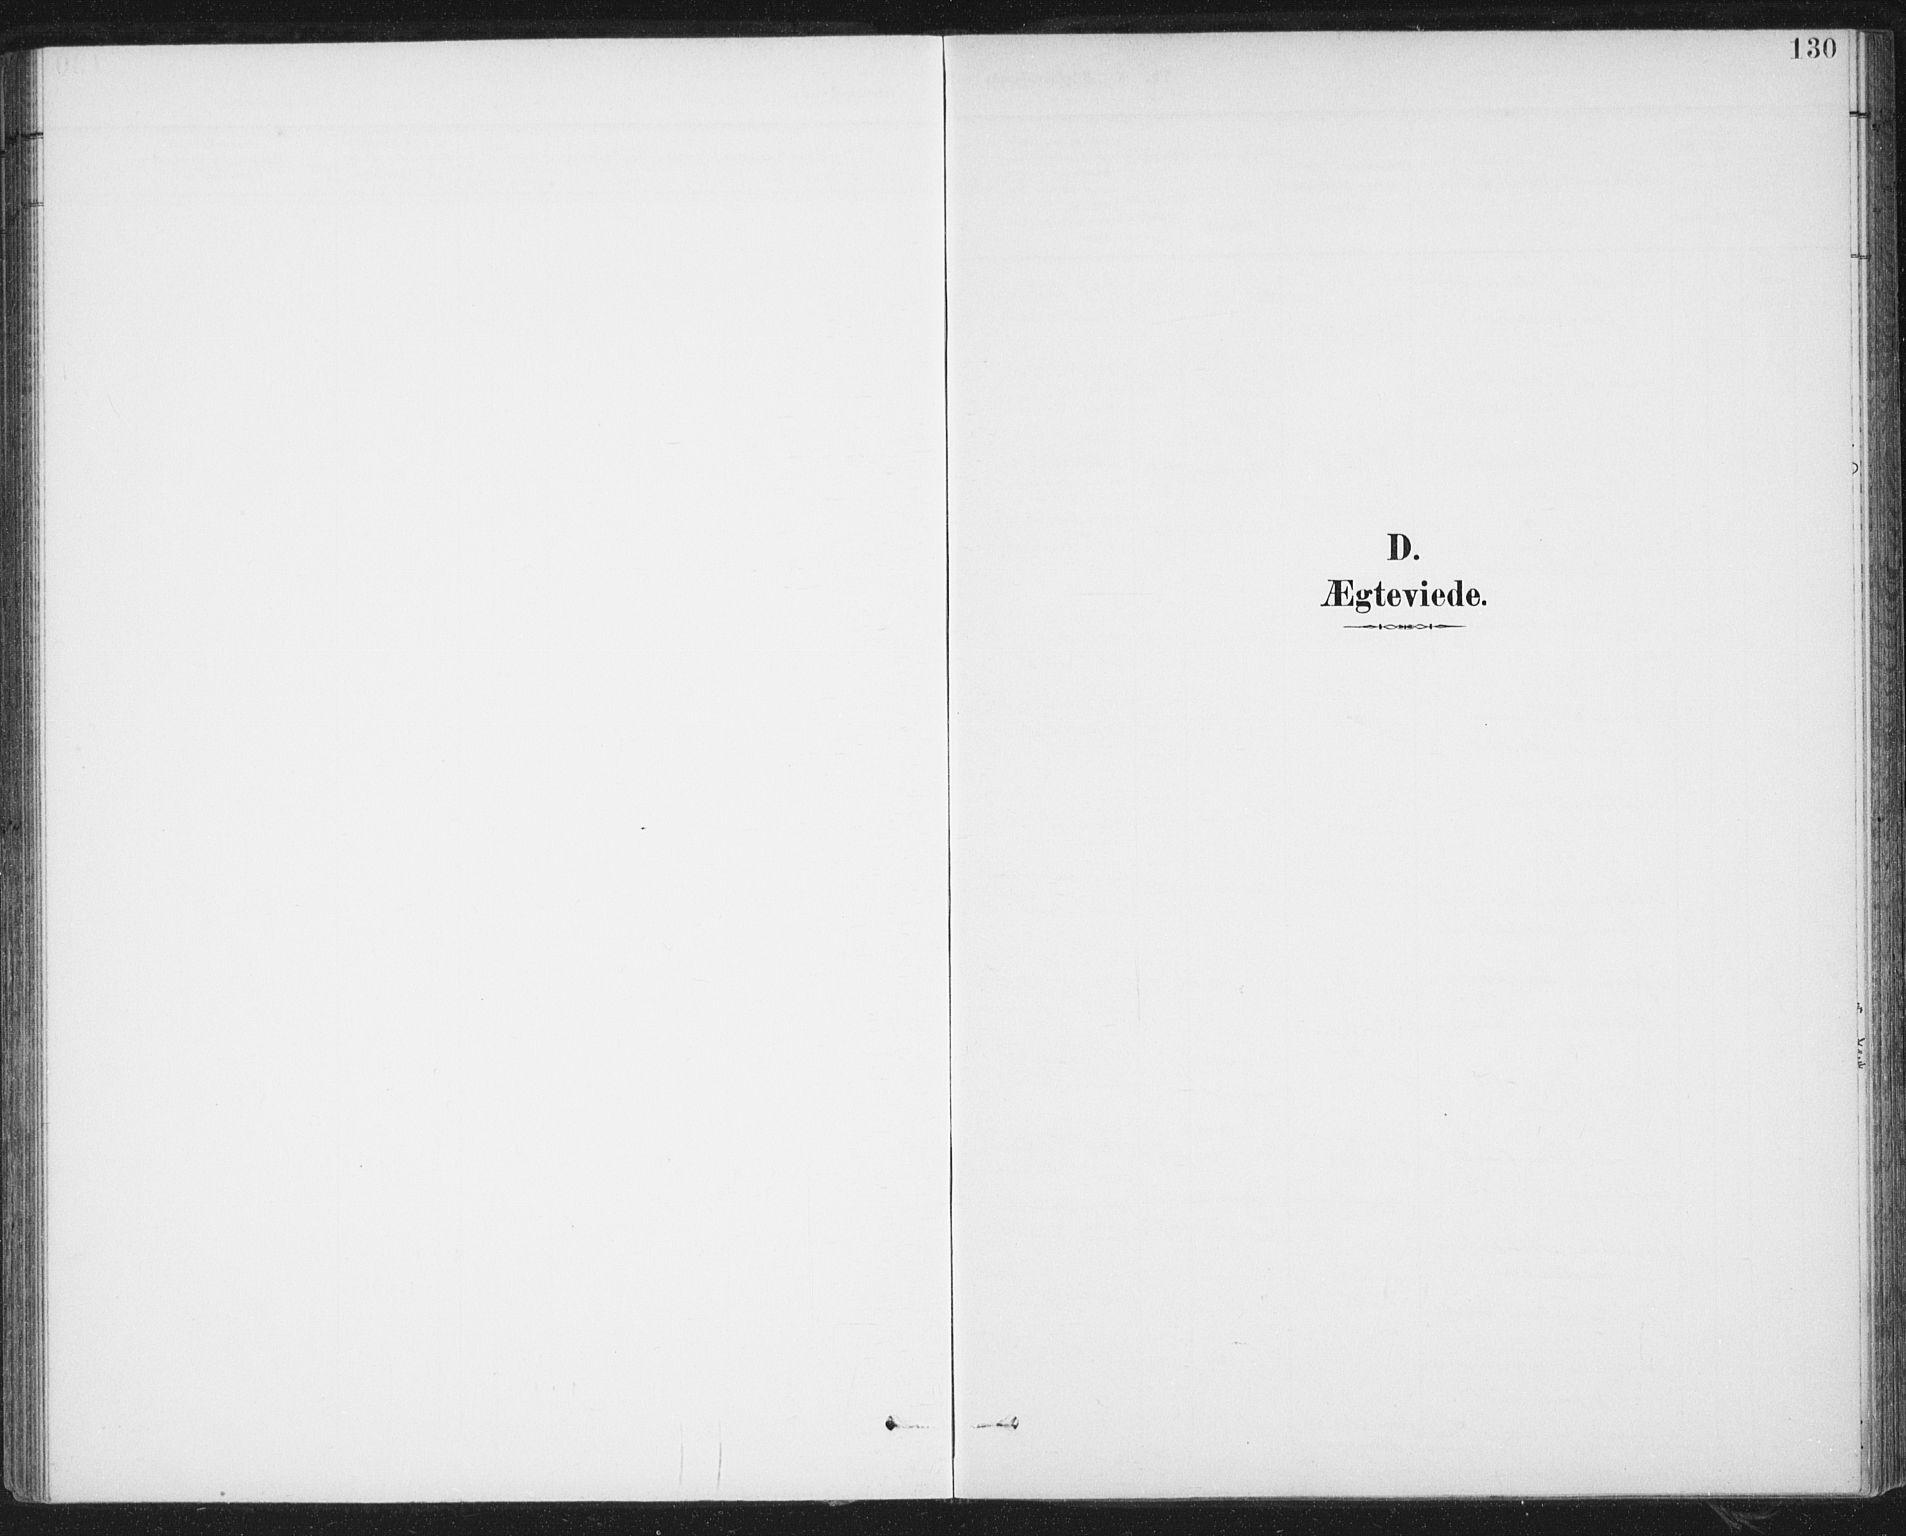 SAT, Ministerialprotokoller, klokkerbøker og fødselsregistre - Nordland, 899/L1437: Ministerialbok nr. 899A05, 1897-1908, s. 130